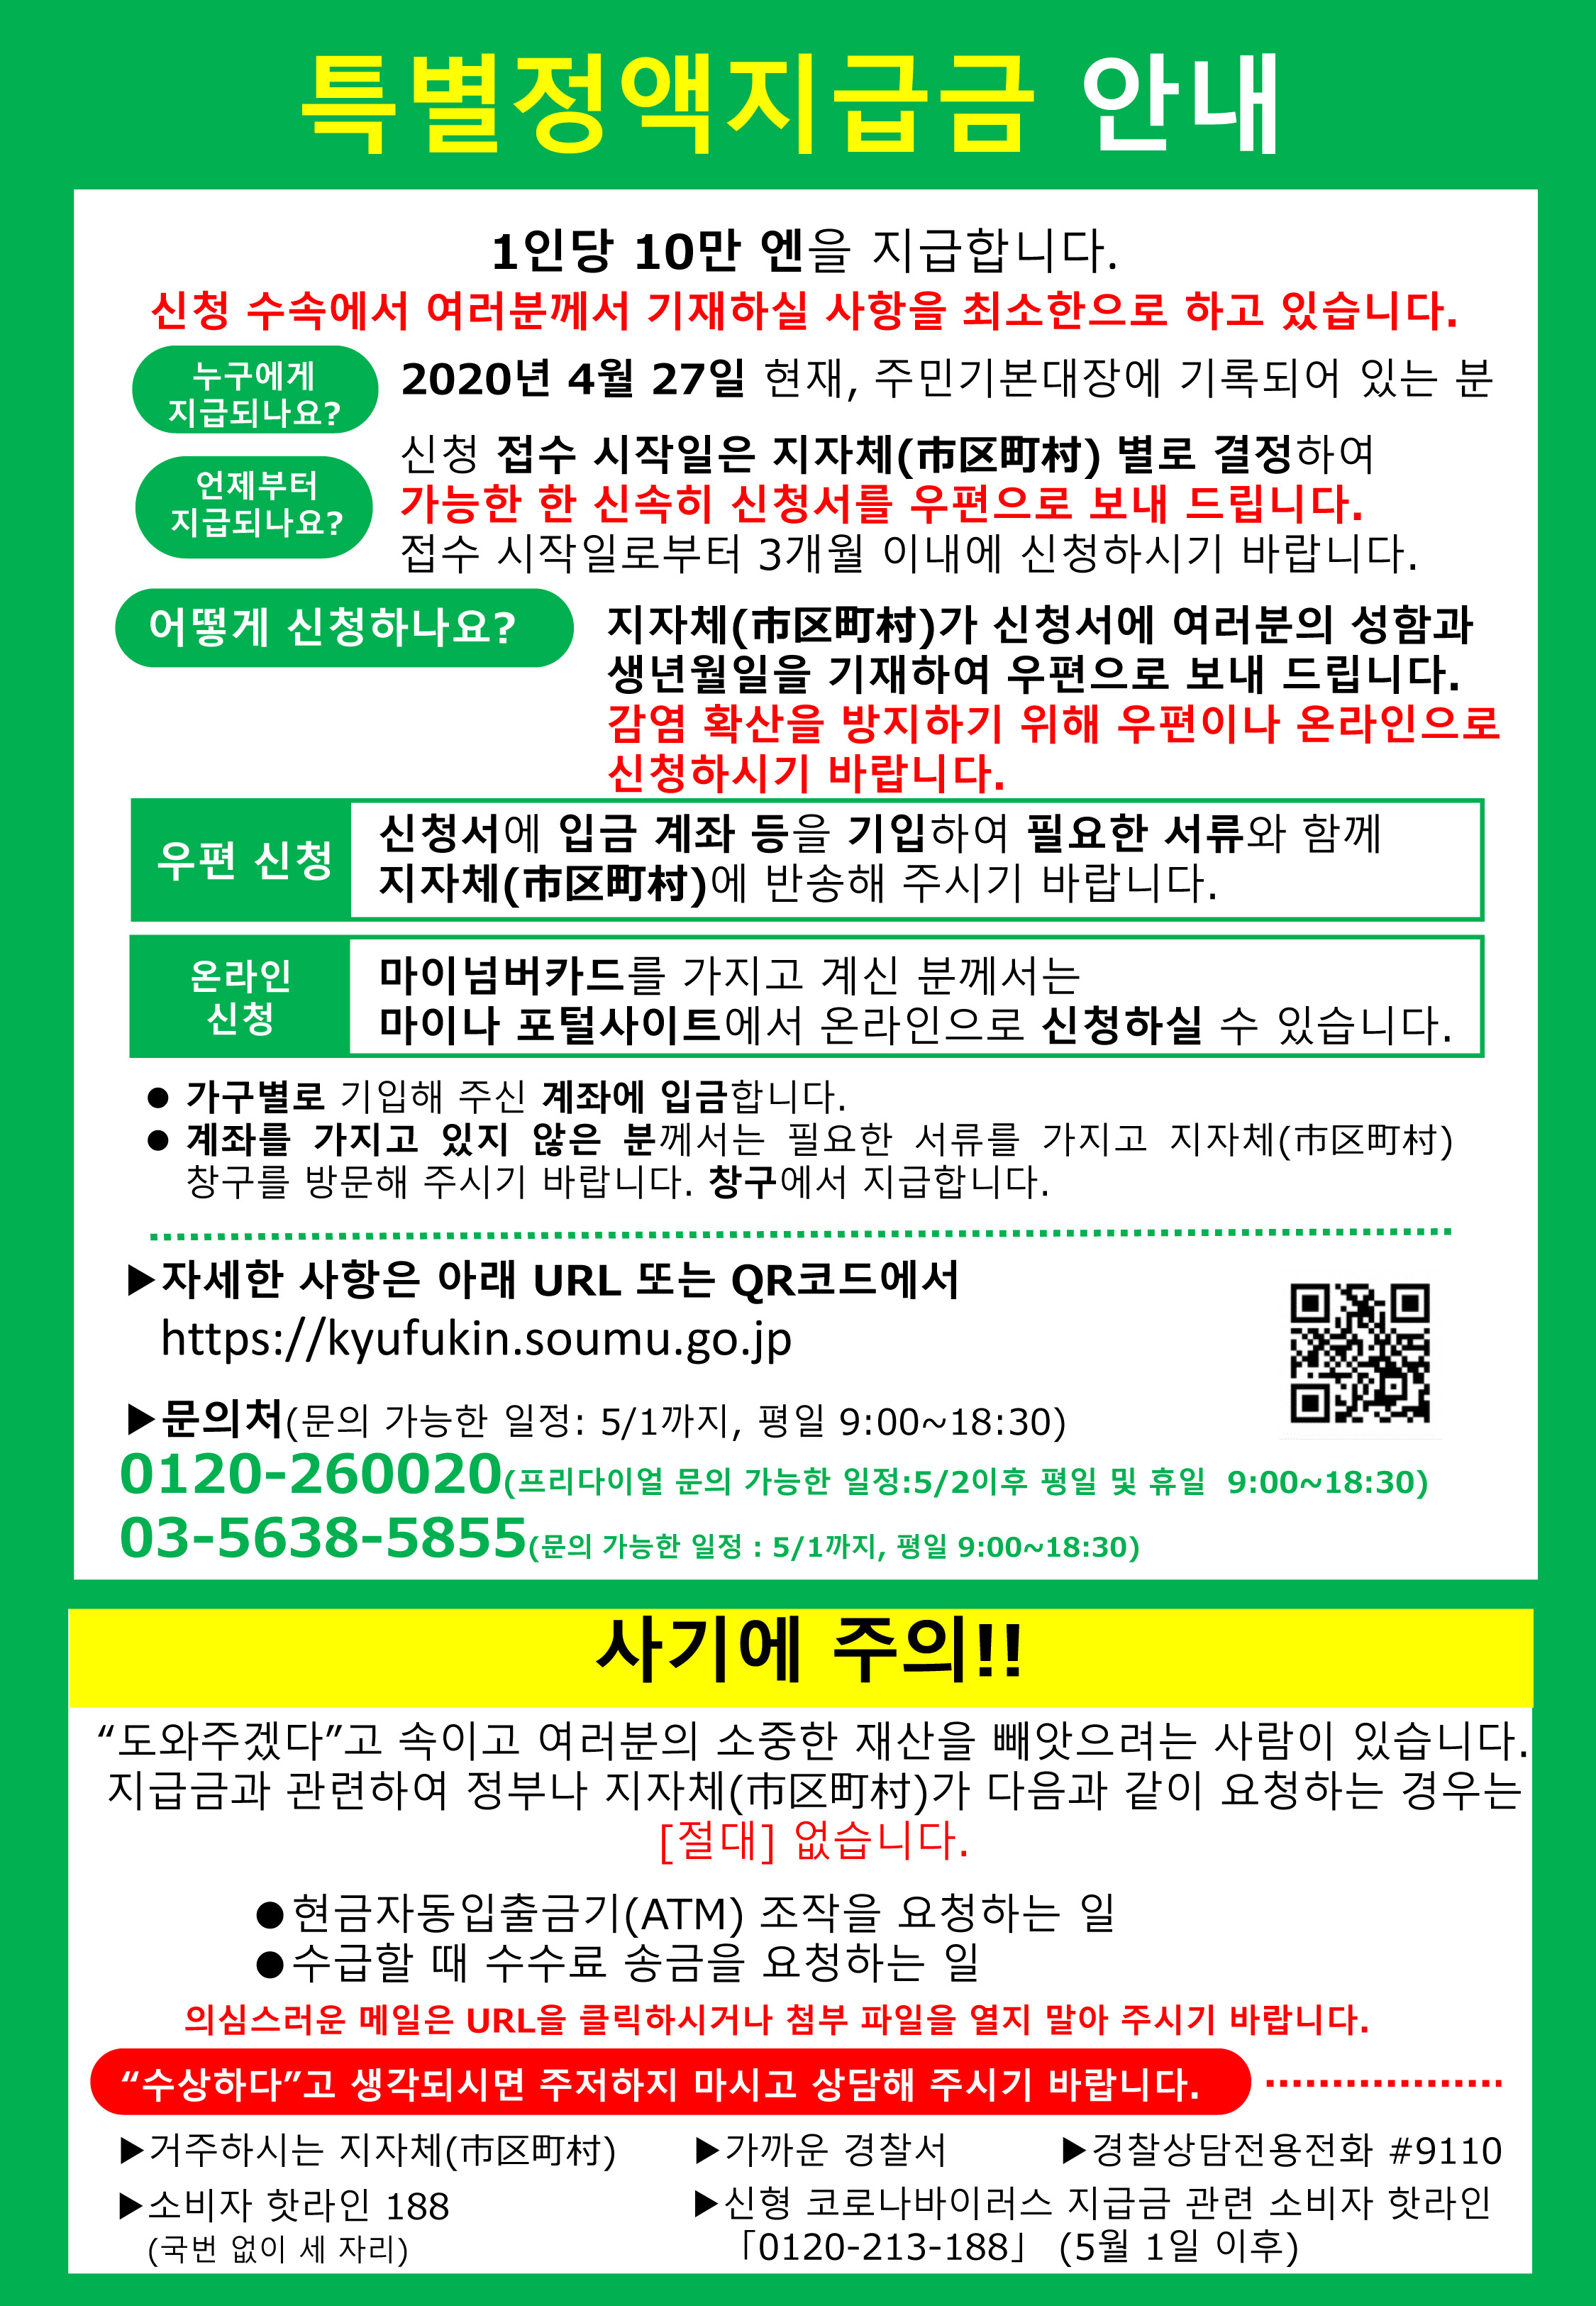 (5)特別定額給付金のご案内(韓国語版)-1